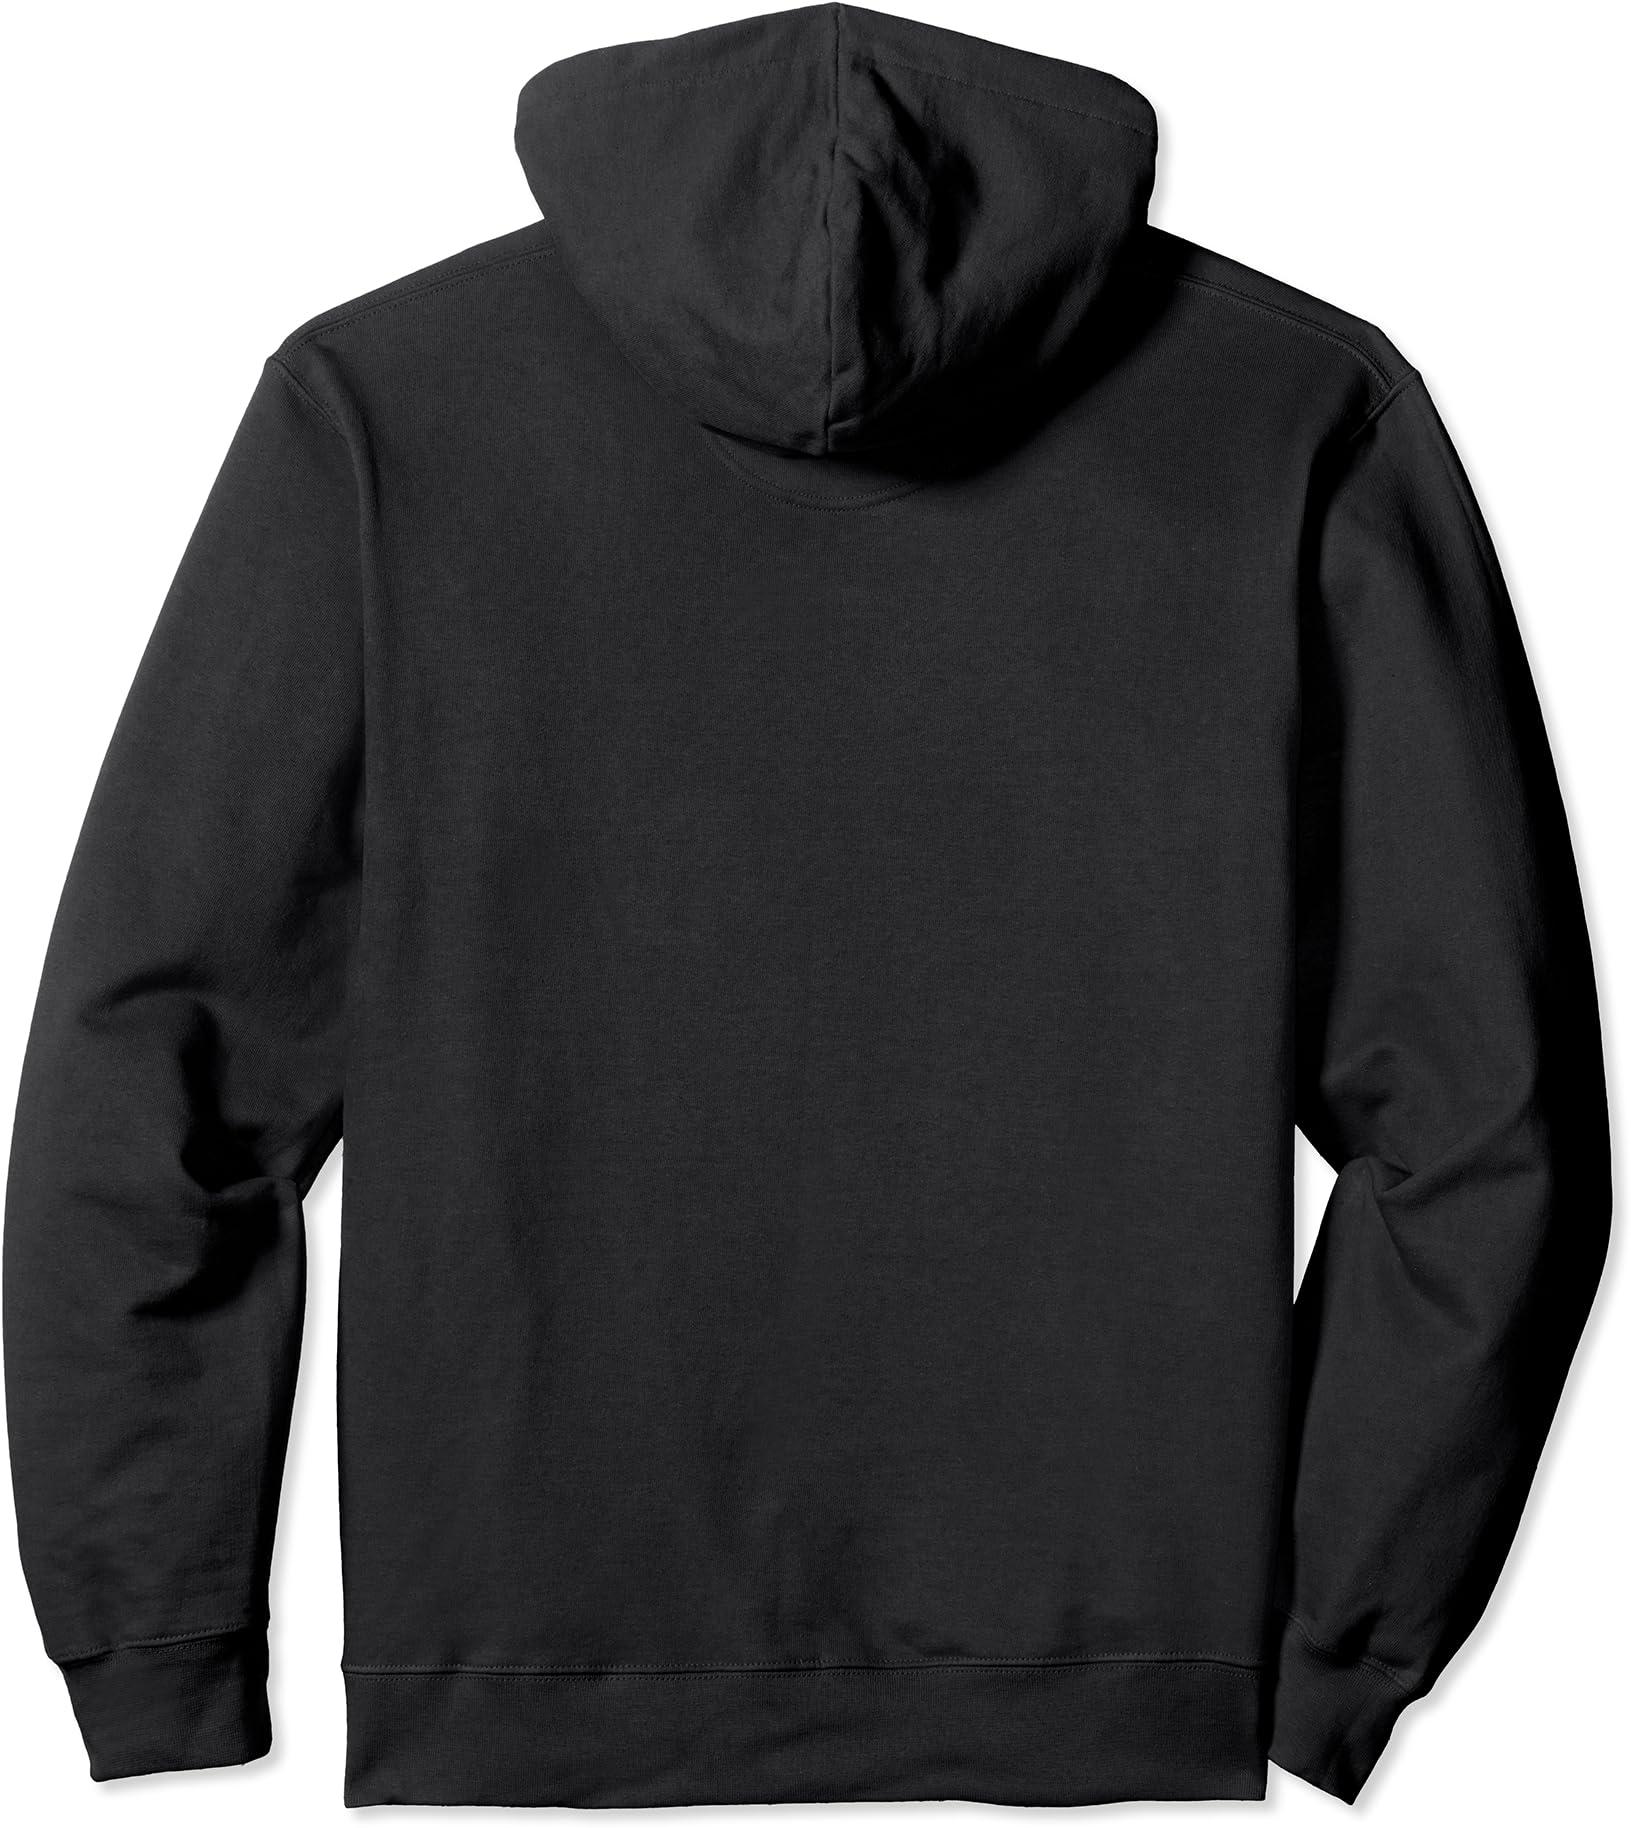 I Love Heart My Son Sweatshirt